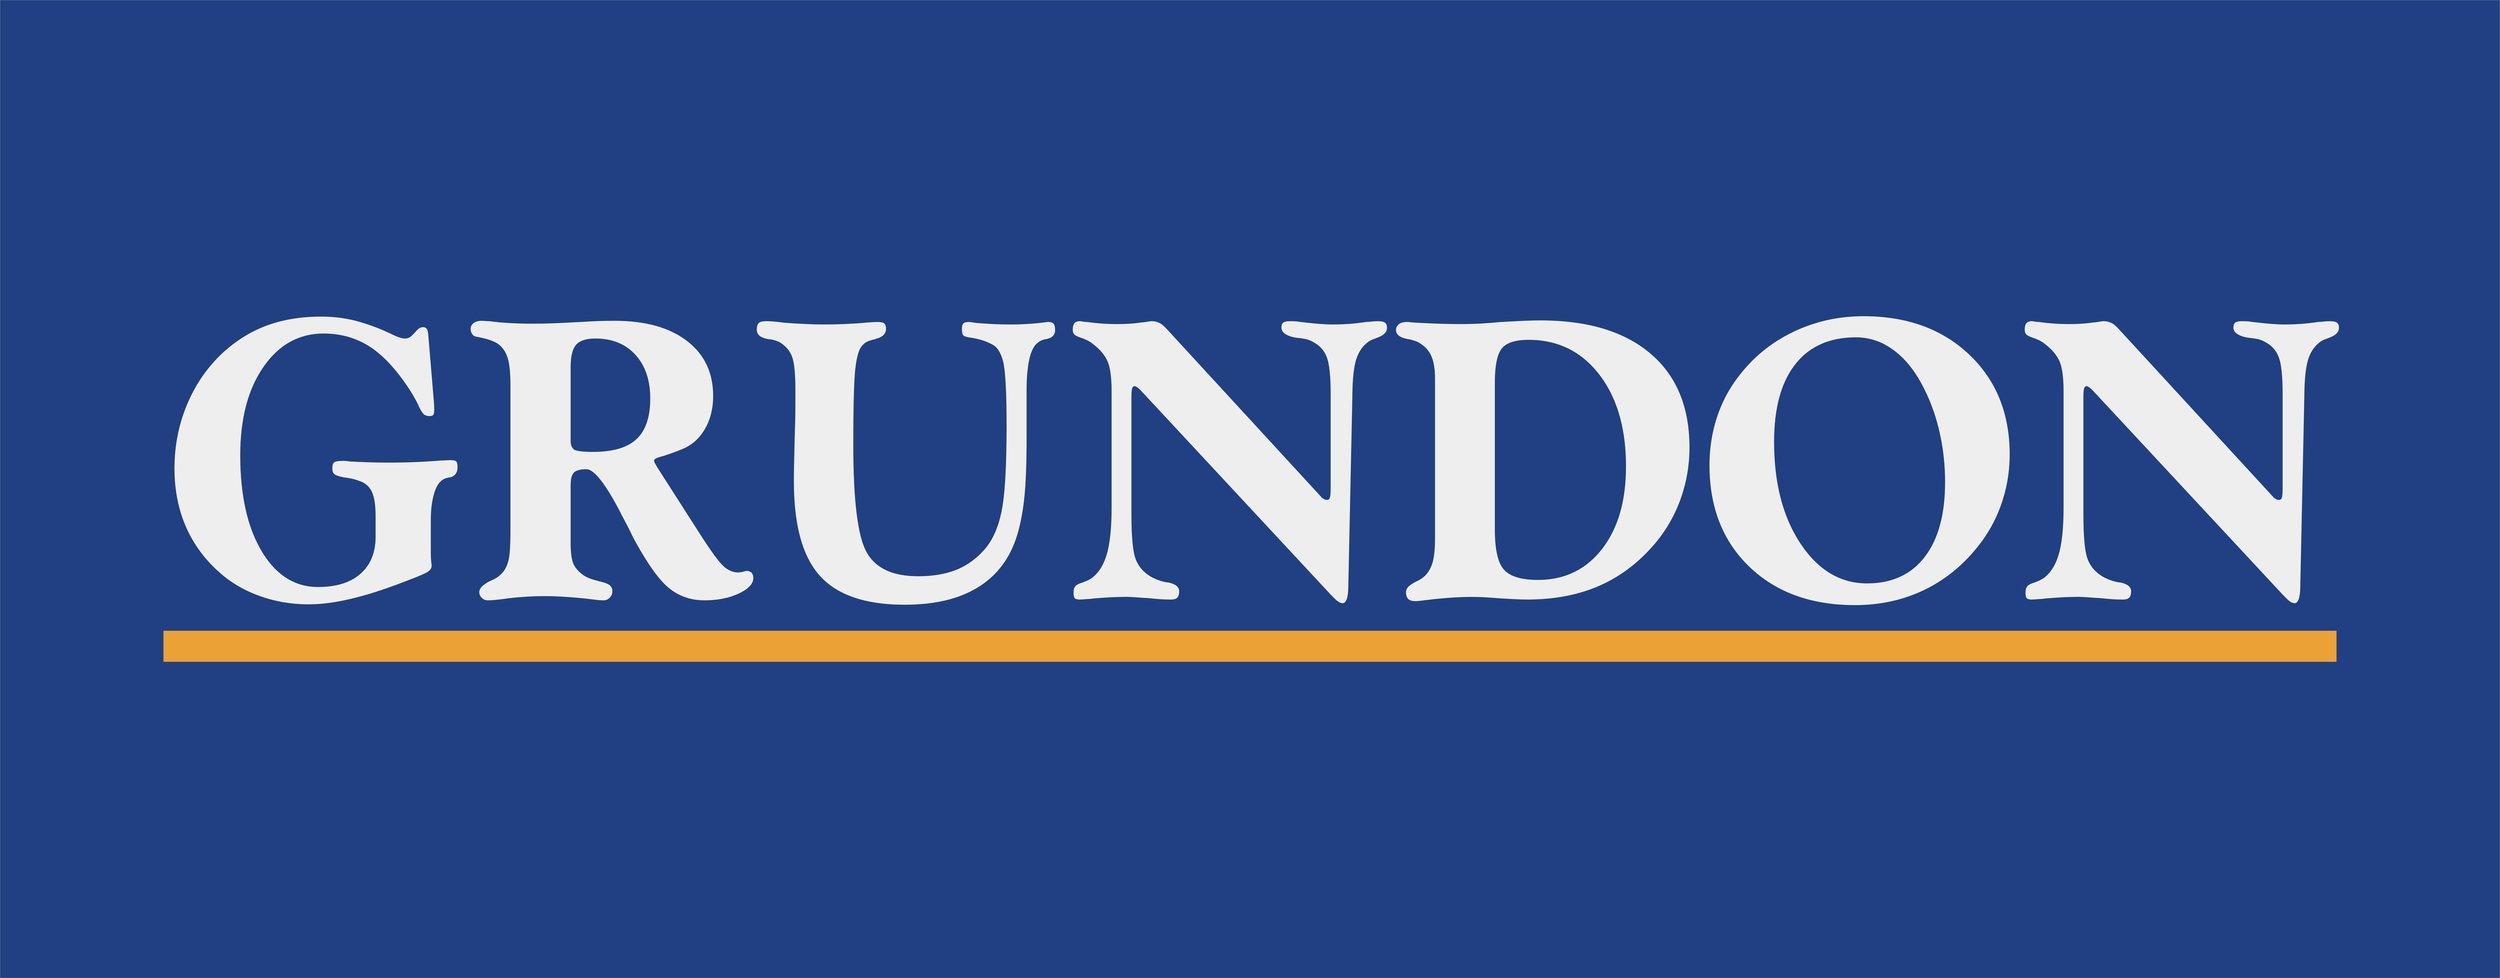 Grundon logo high res.jpg